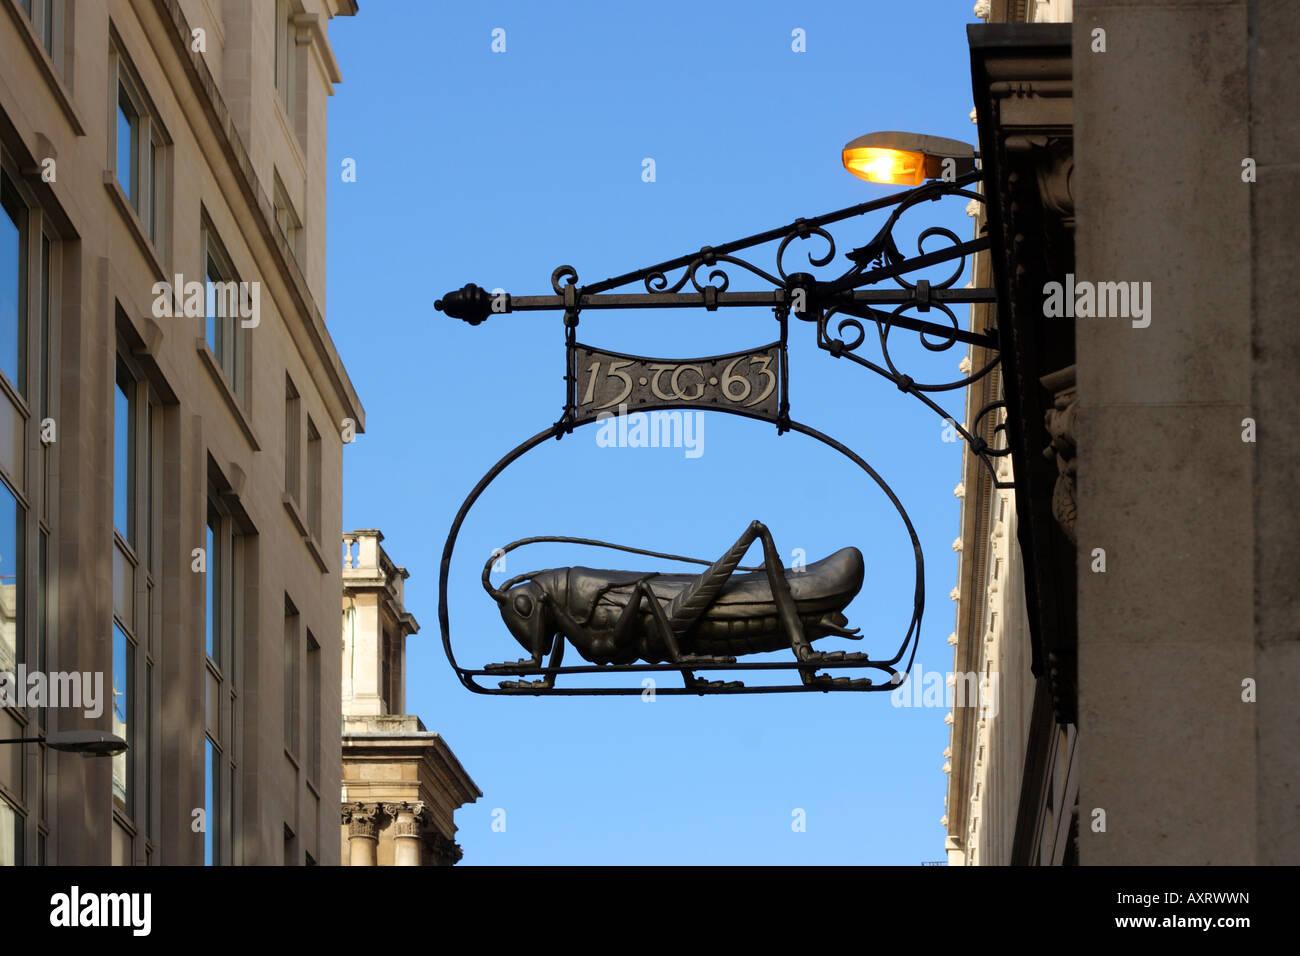 Commemorative trade sign in Gresham Street, London - Stock Image